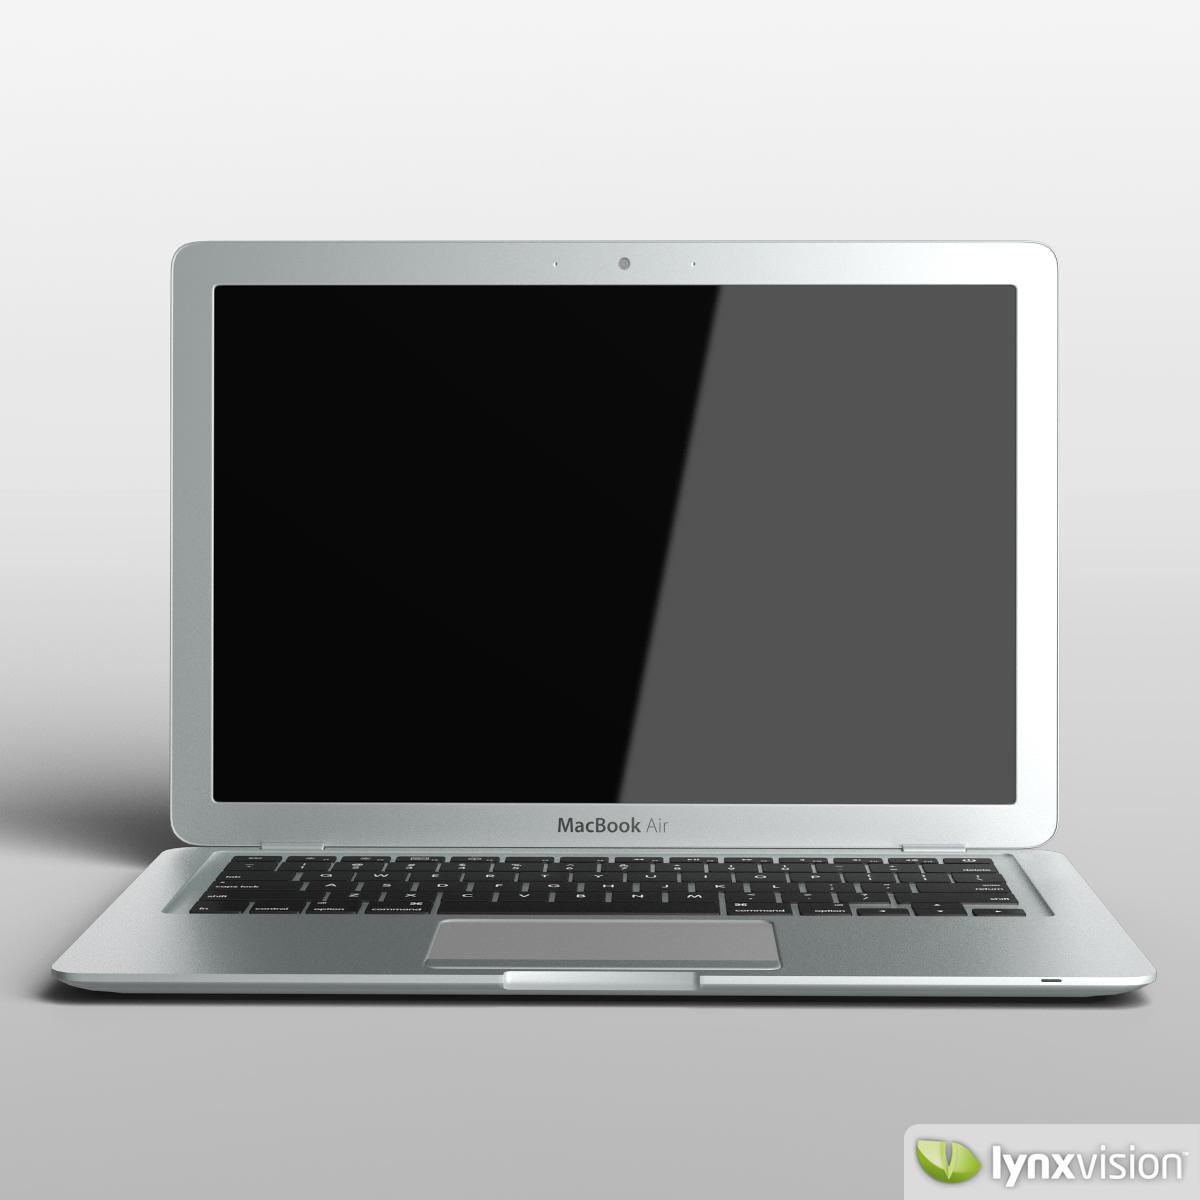 apple macbook air notebook 3d model max obj fbx mtl. Black Bedroom Furniture Sets. Home Design Ideas